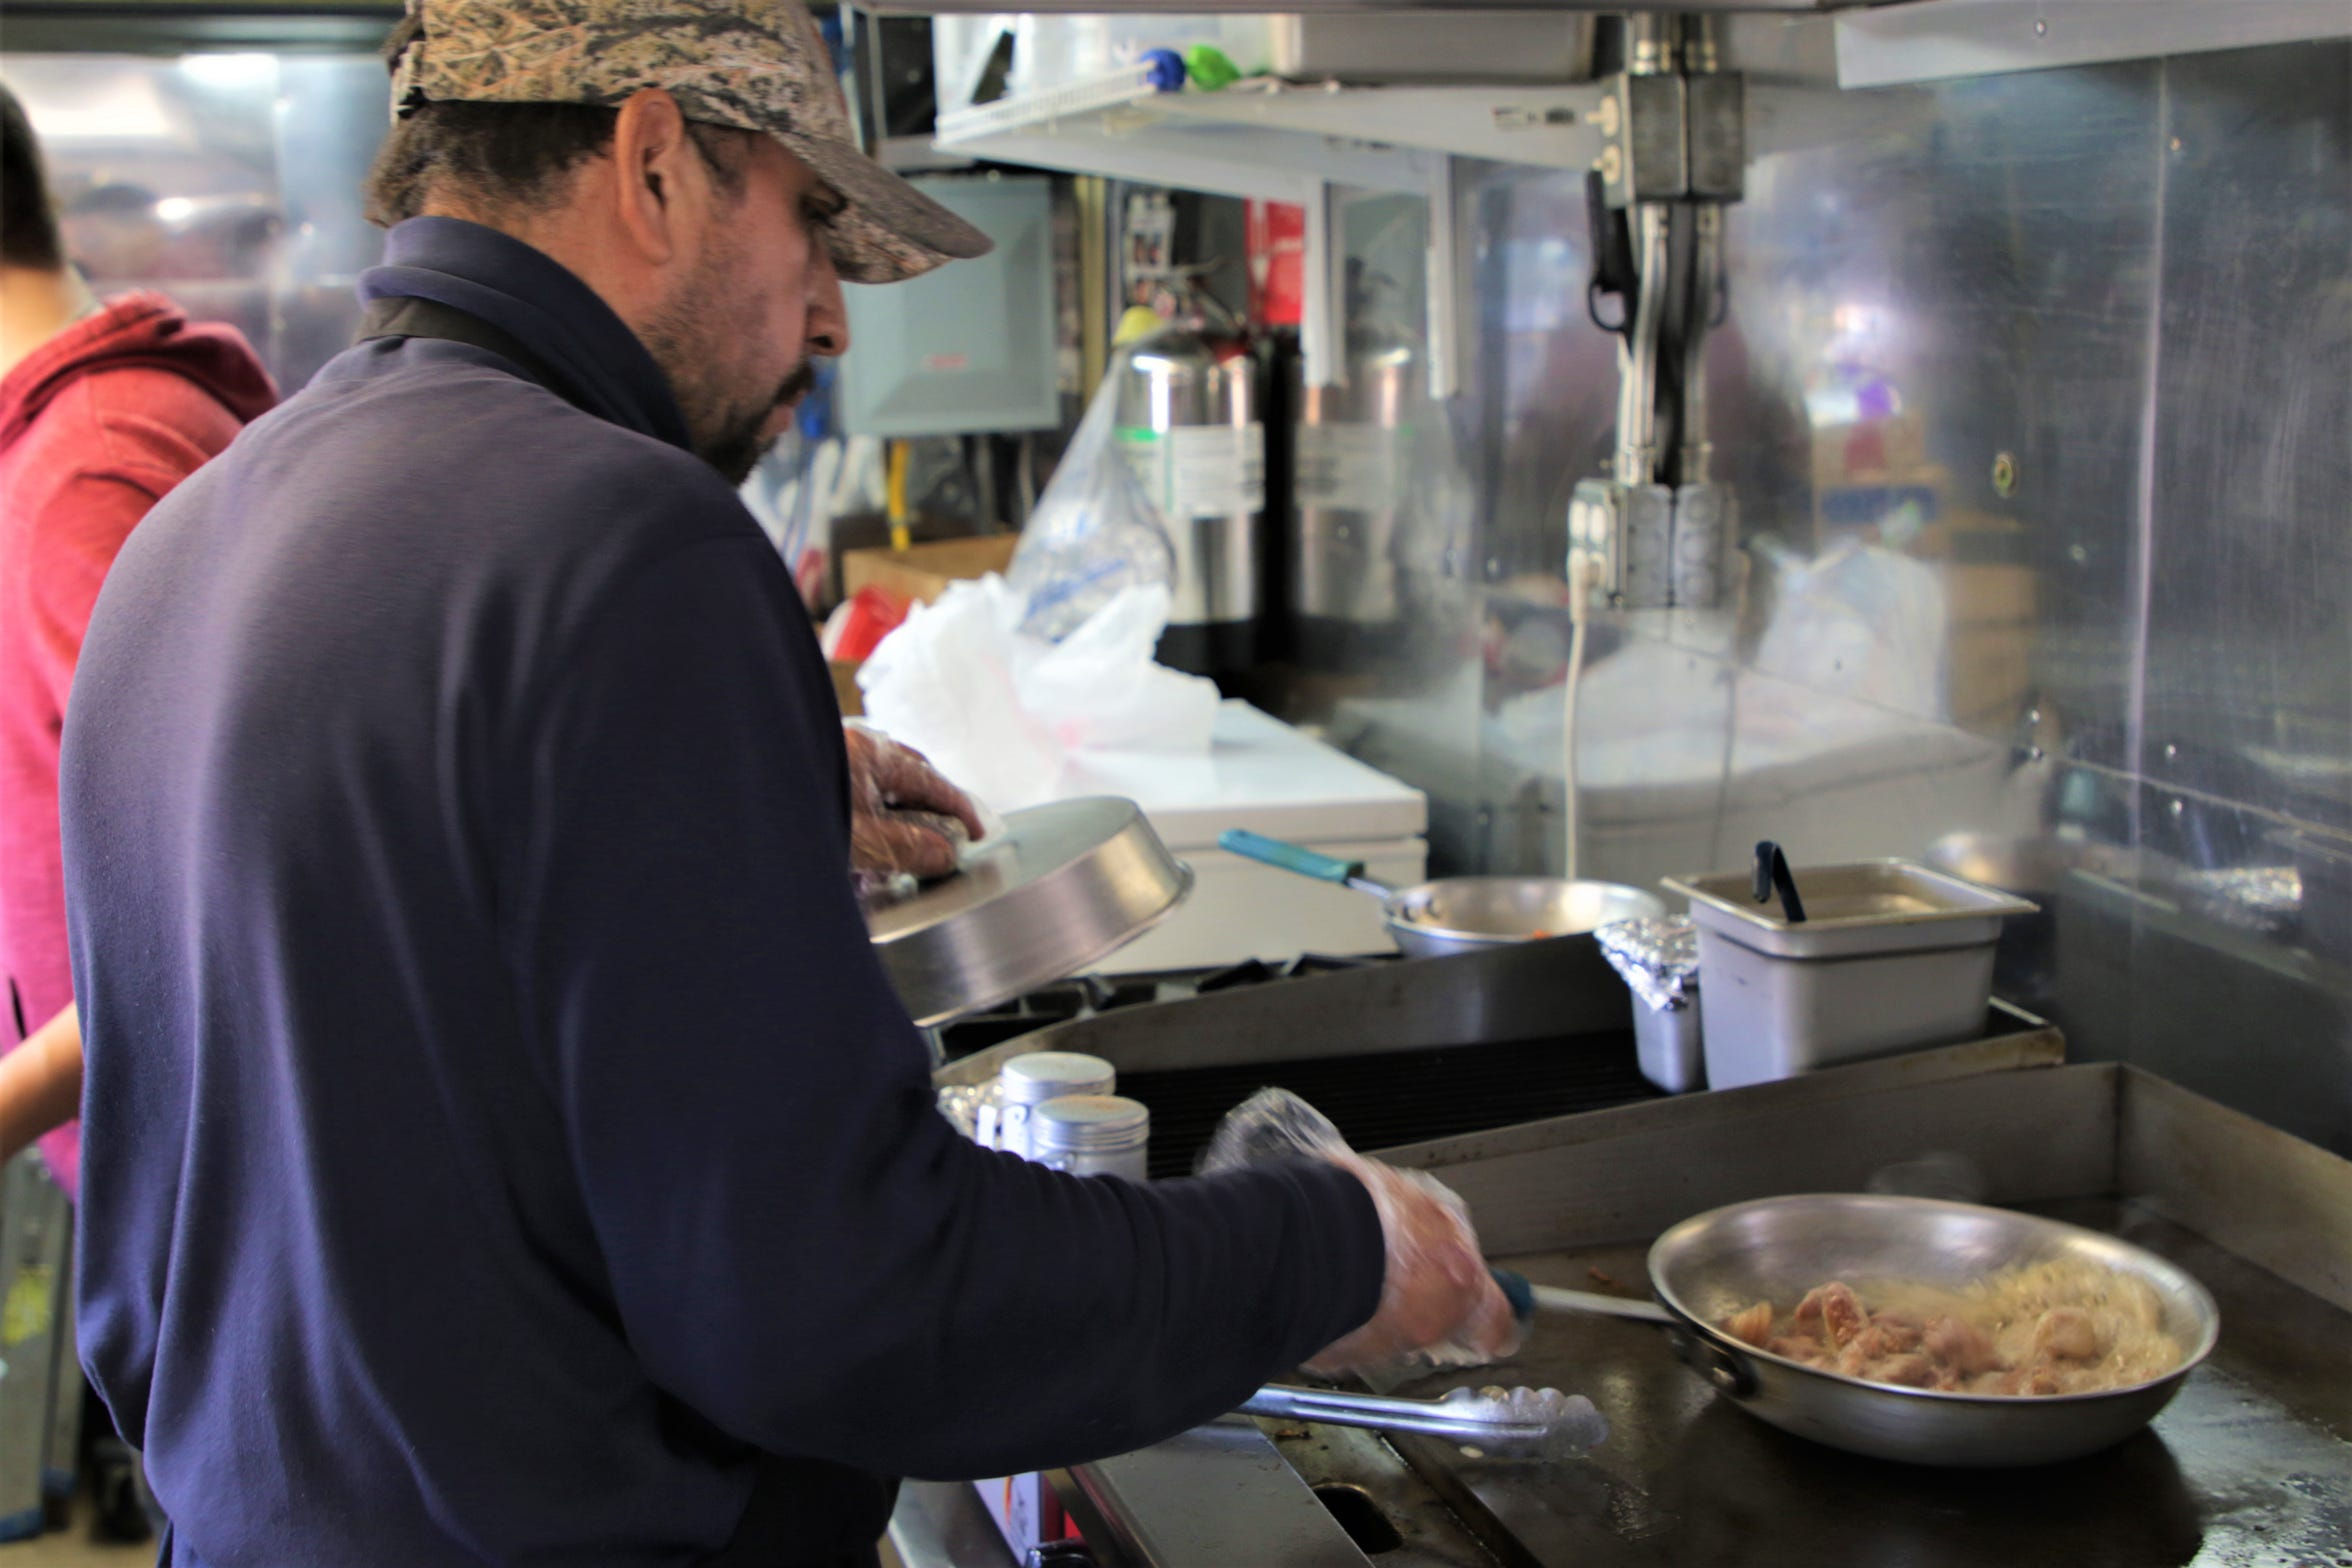 Owner of El Torito food truck Rafael Mercado cooks inside his food truck in Farmington on Nov. 7, 2019.